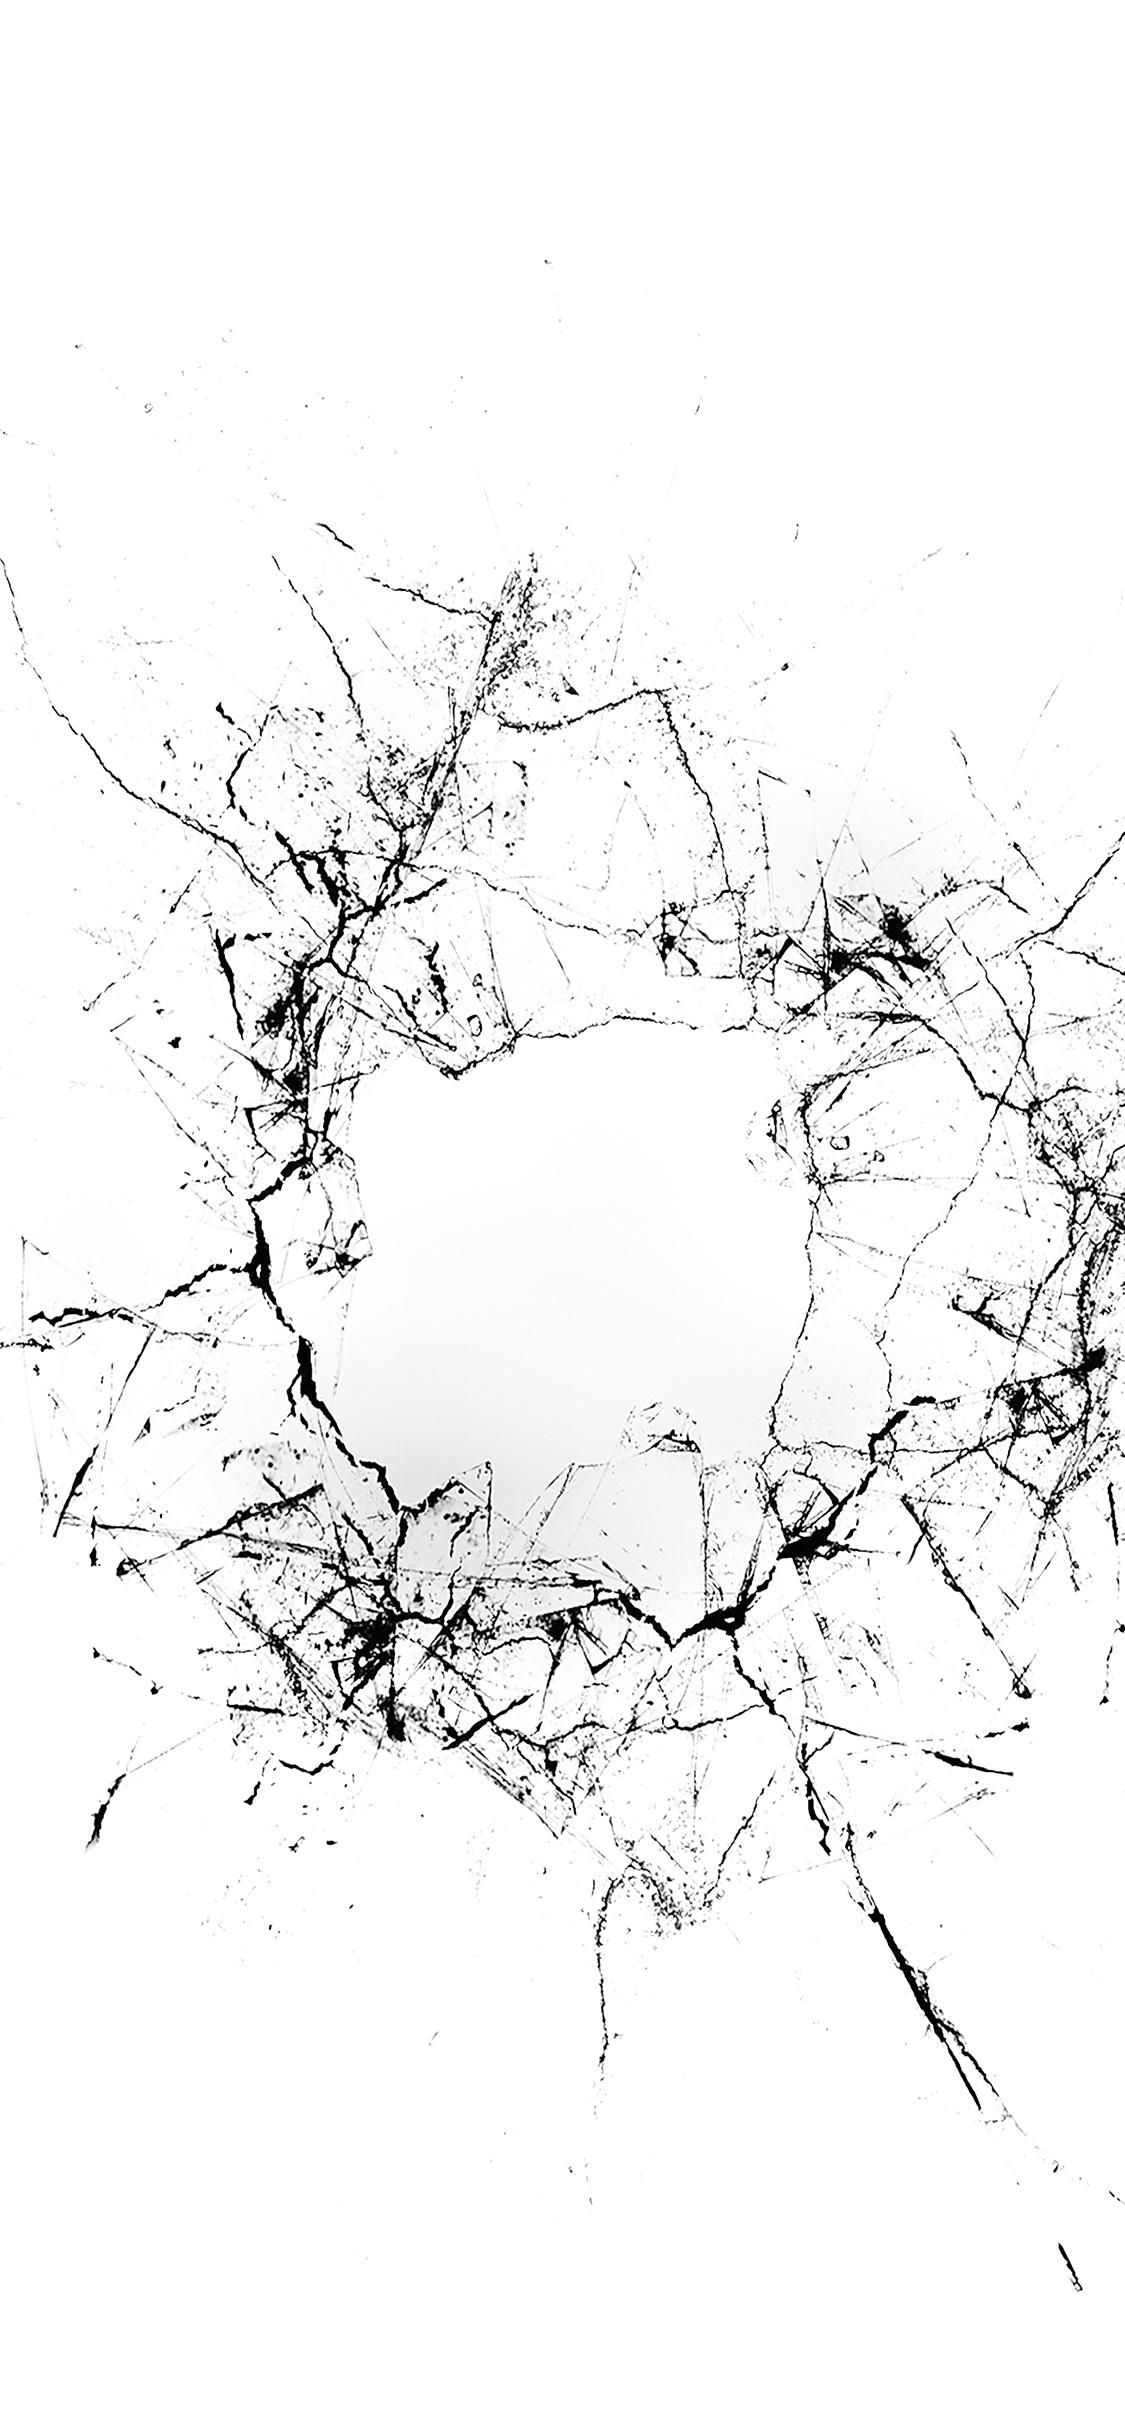 iPhonexpapers.com-Apple-iPhone-wallpaper-vu20-crack-glass-white-bw-texture-pattern